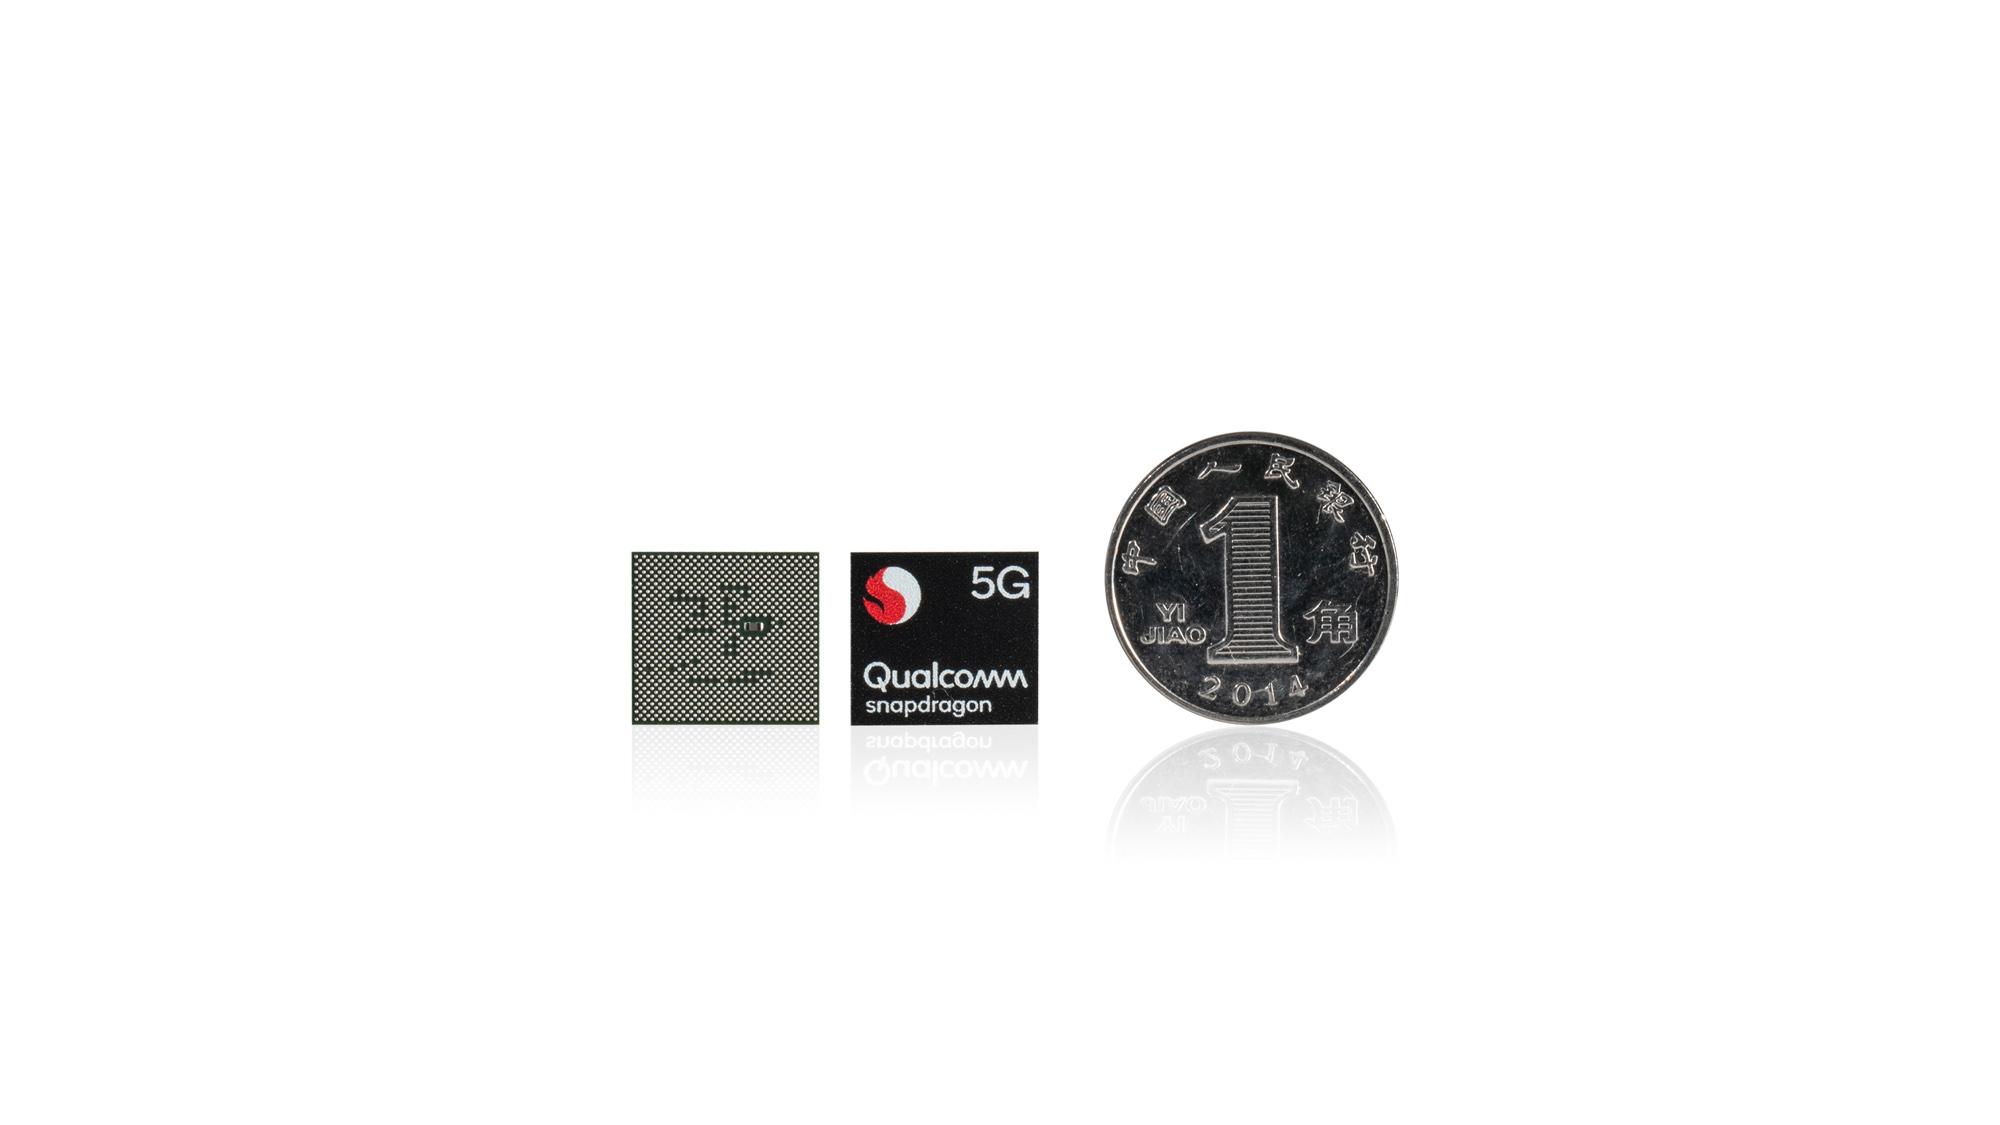 qualcomm-snapdragon-765-5g-mobile-platform-chinese-coin.jpg